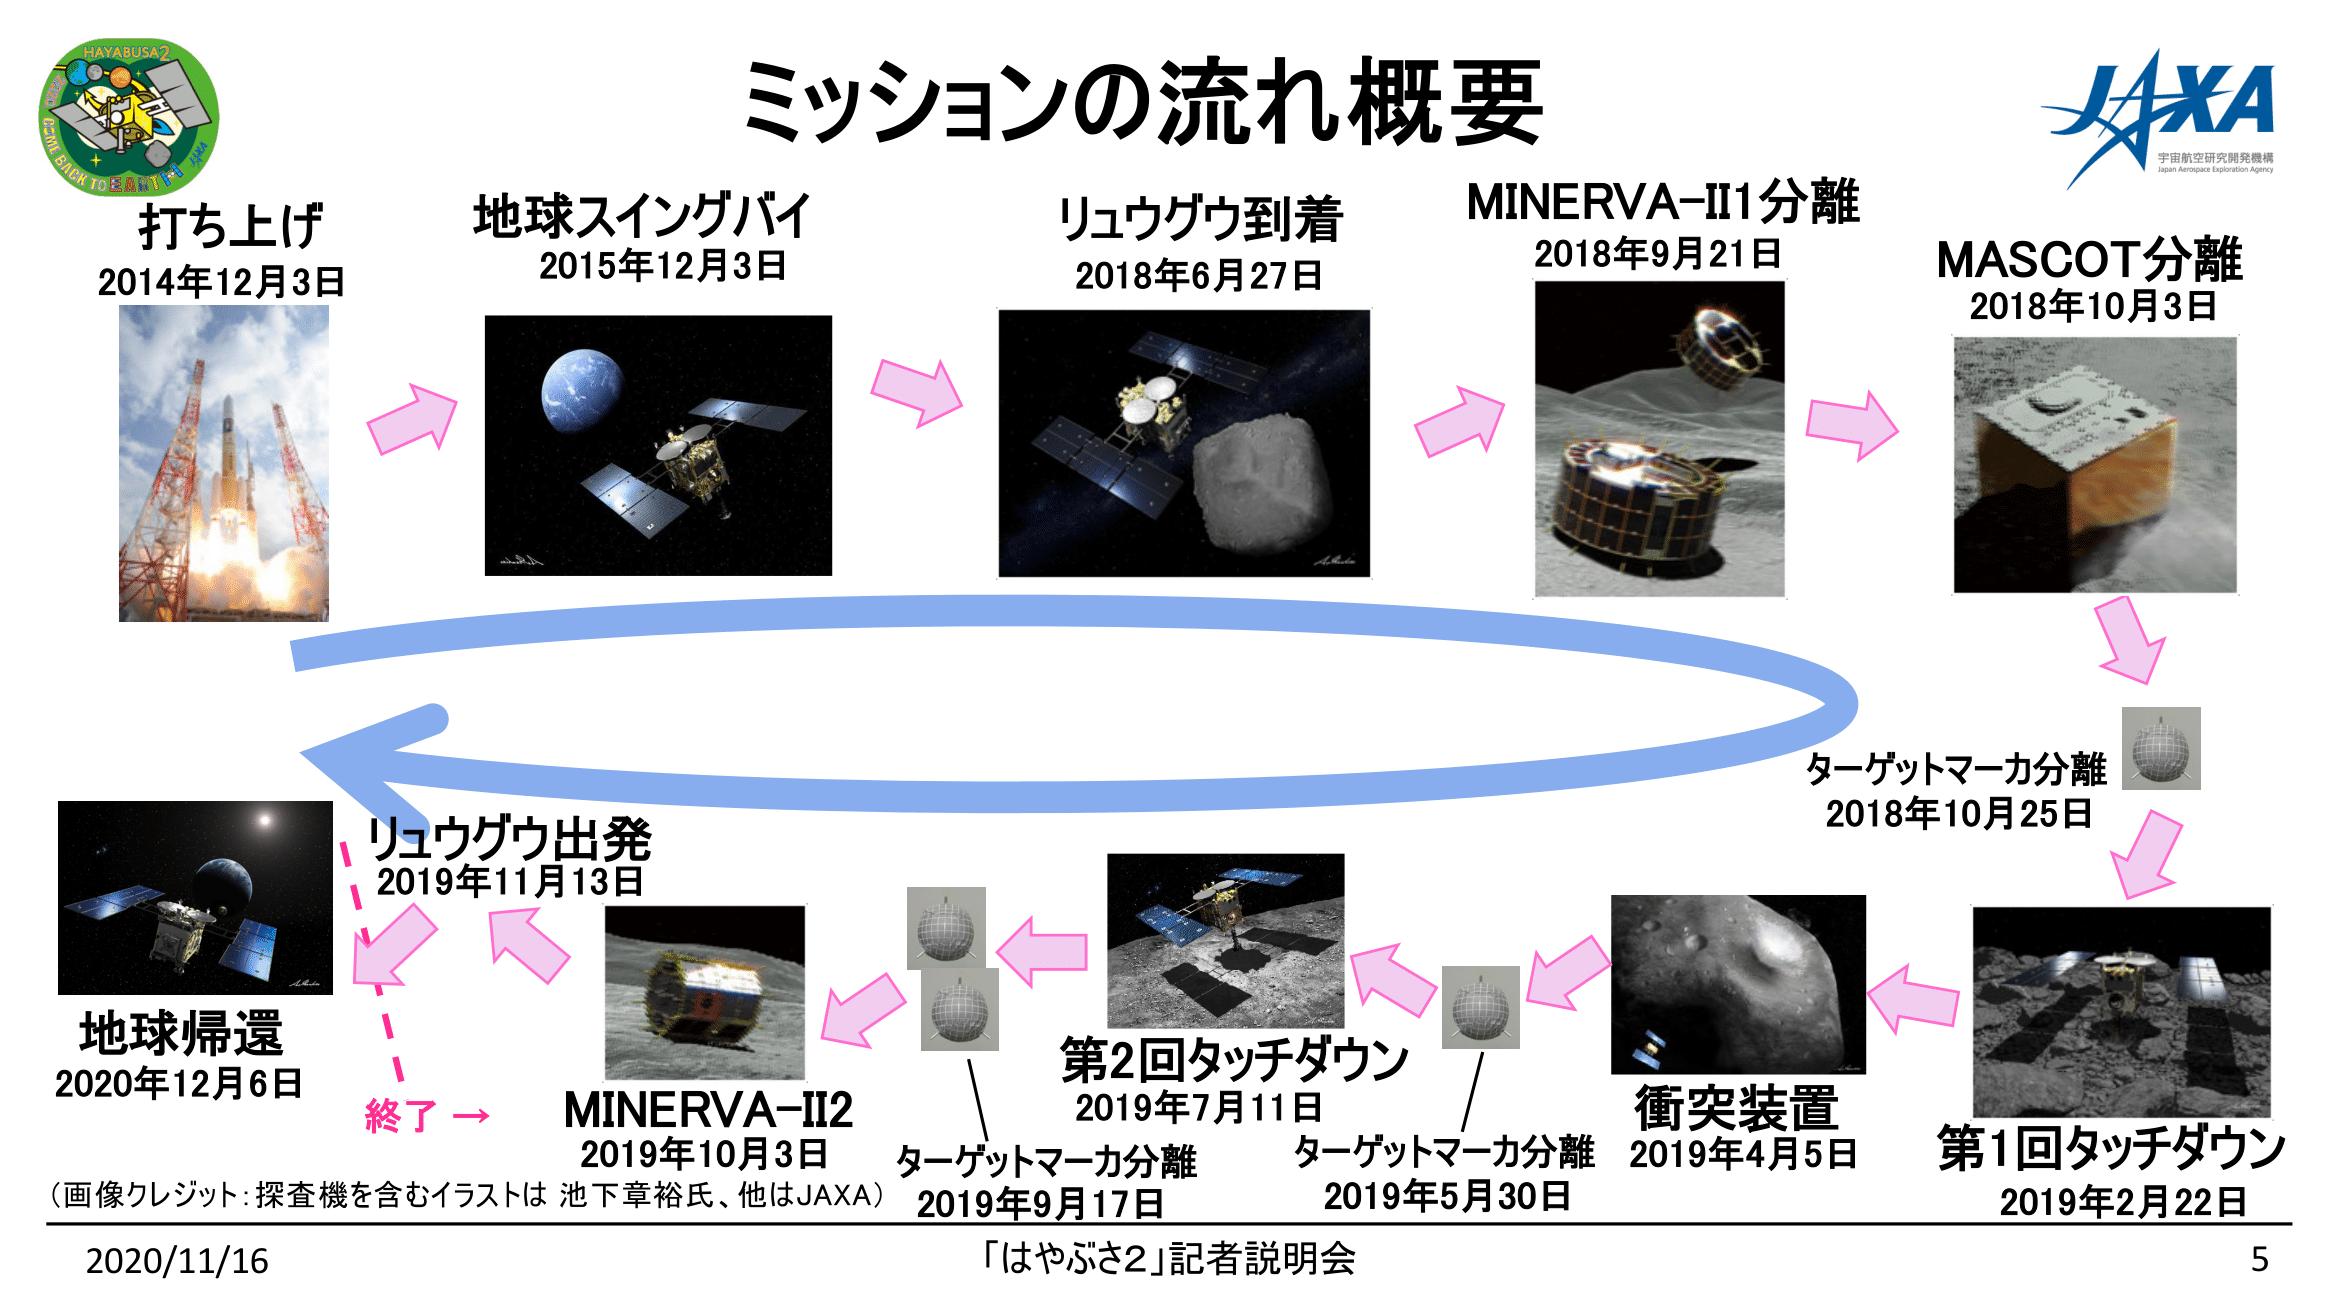 f:id:Imamura:20201116151122p:plain